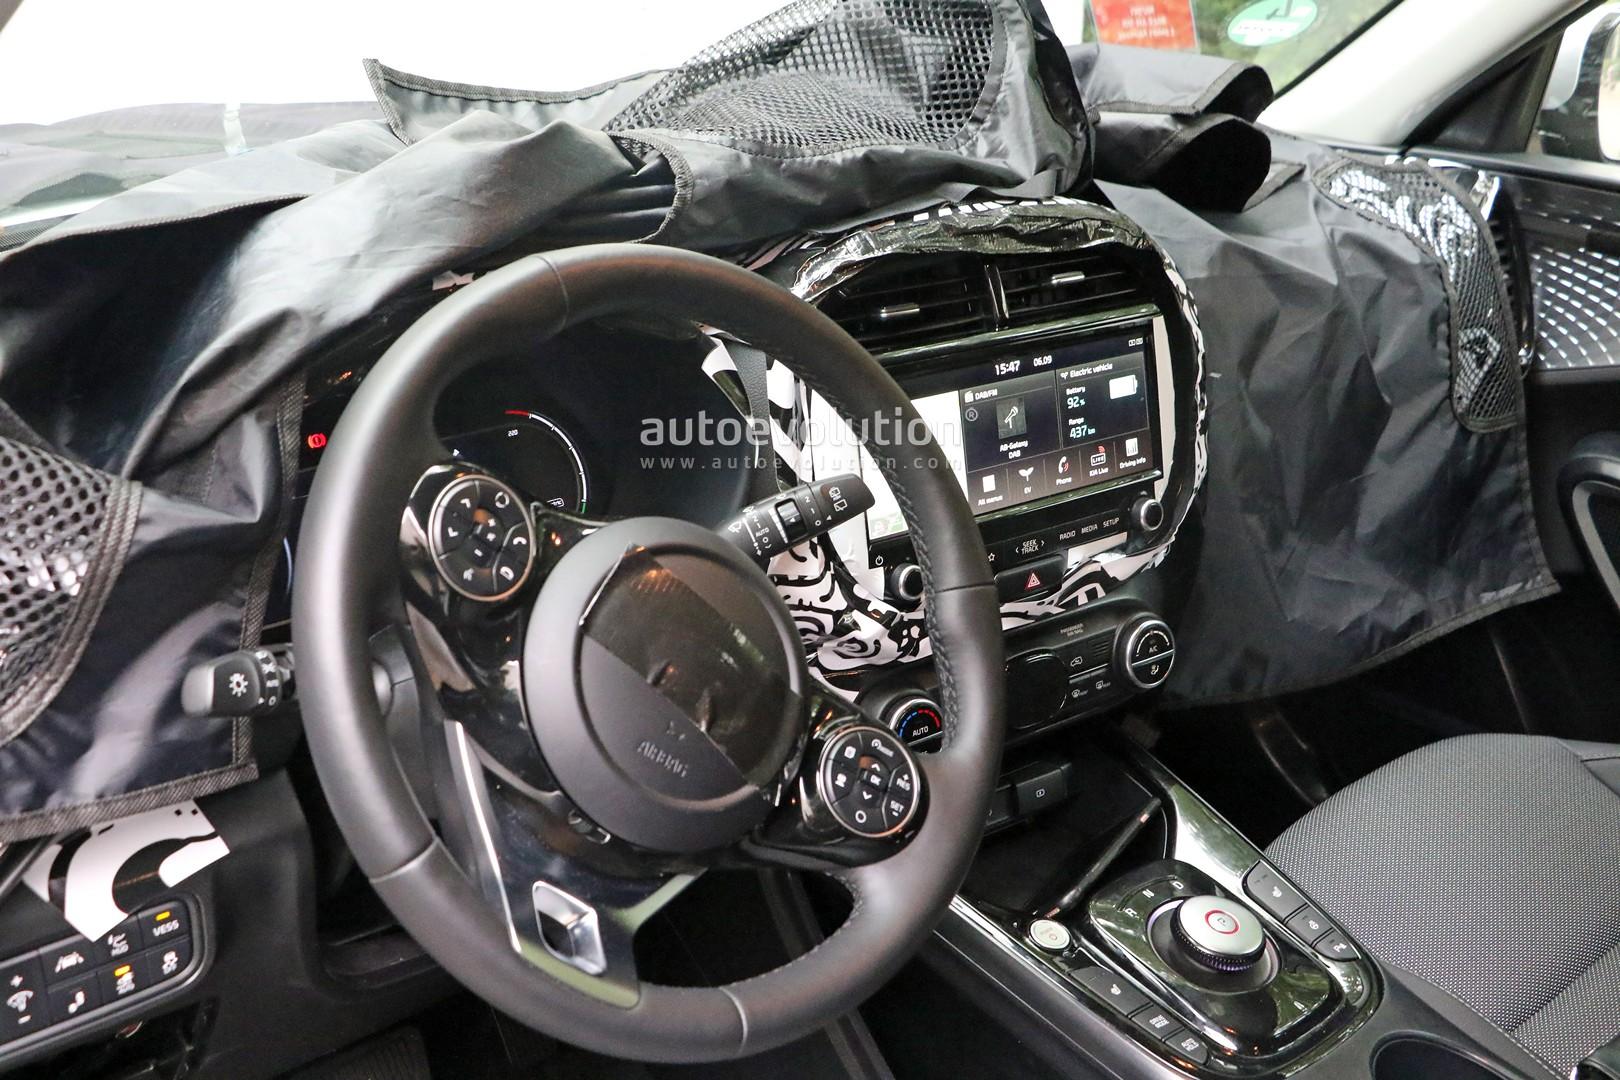 2020 Kia Soul Ev Reveals Interior Probably Has 500 Km Range